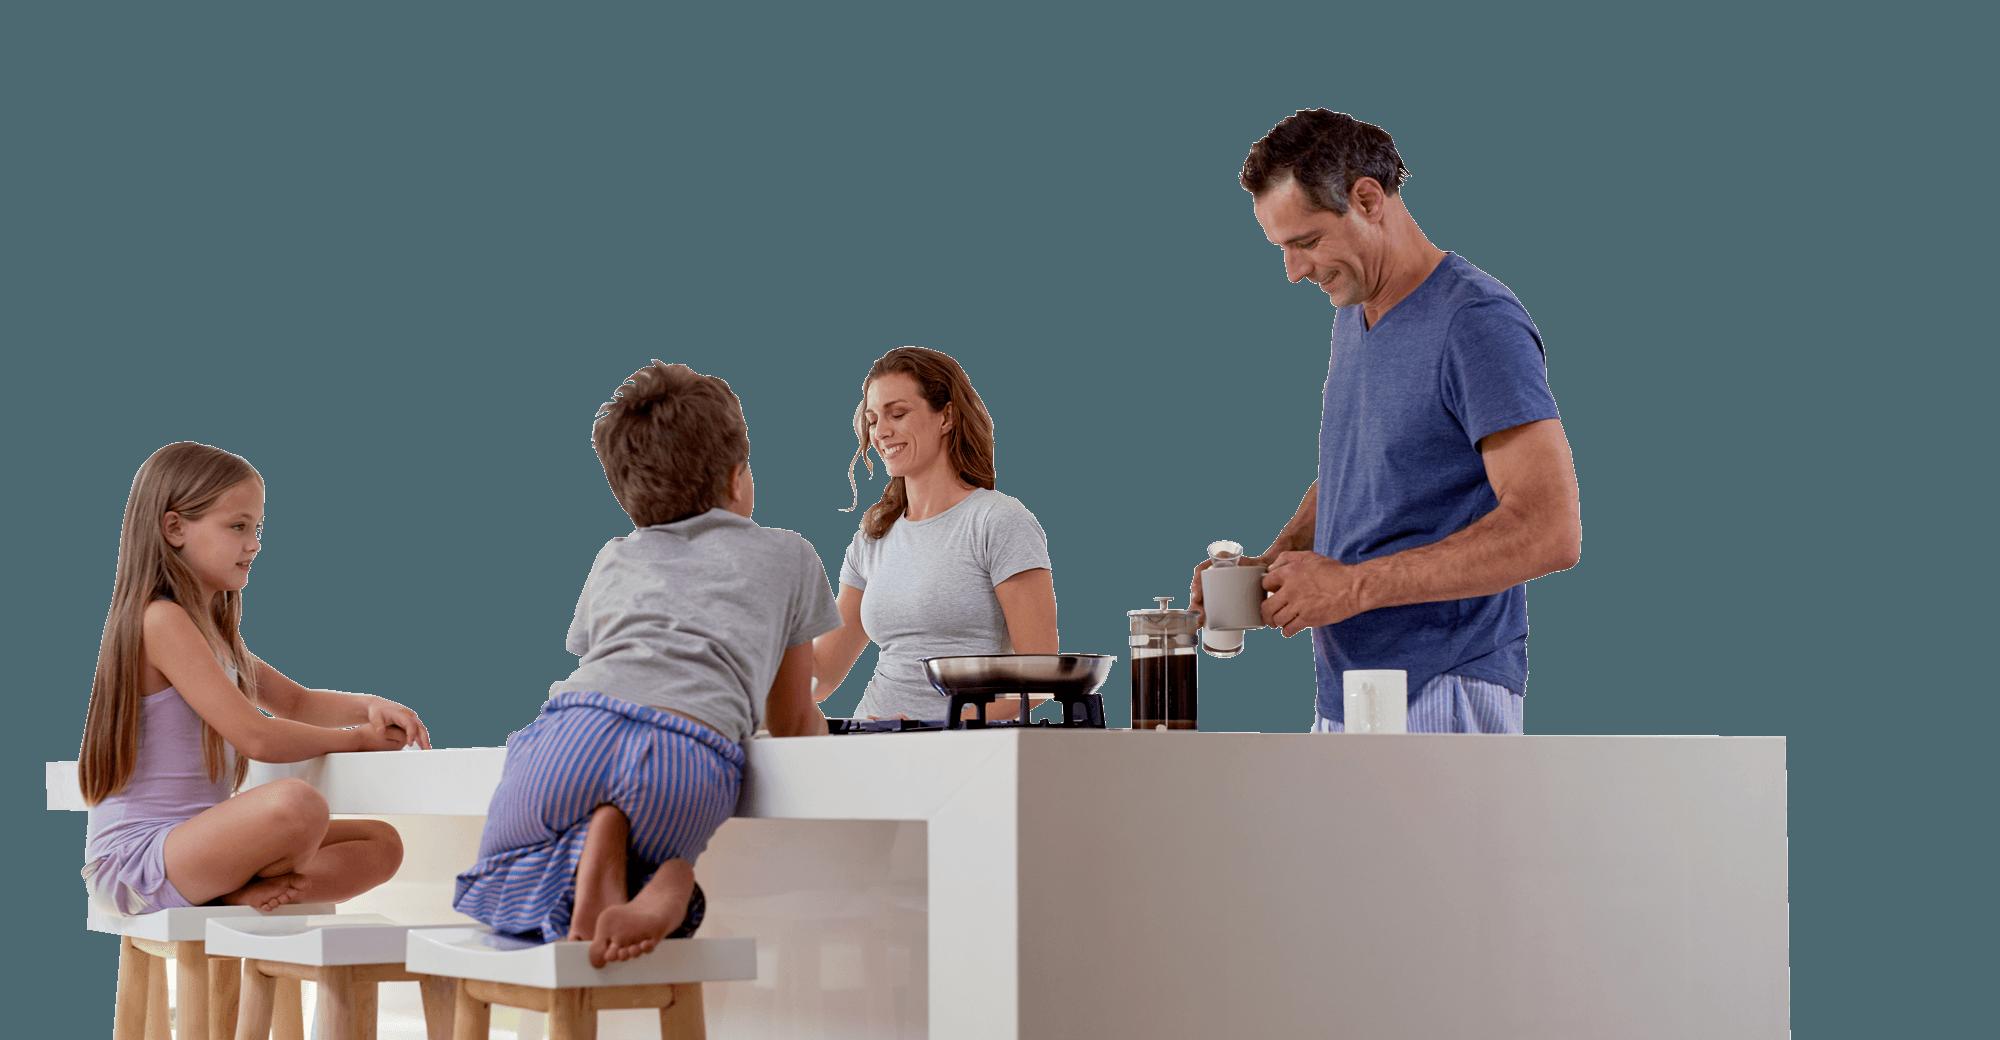 Kitchen Appliance Insurance | Smart Sure Appliance Insurance